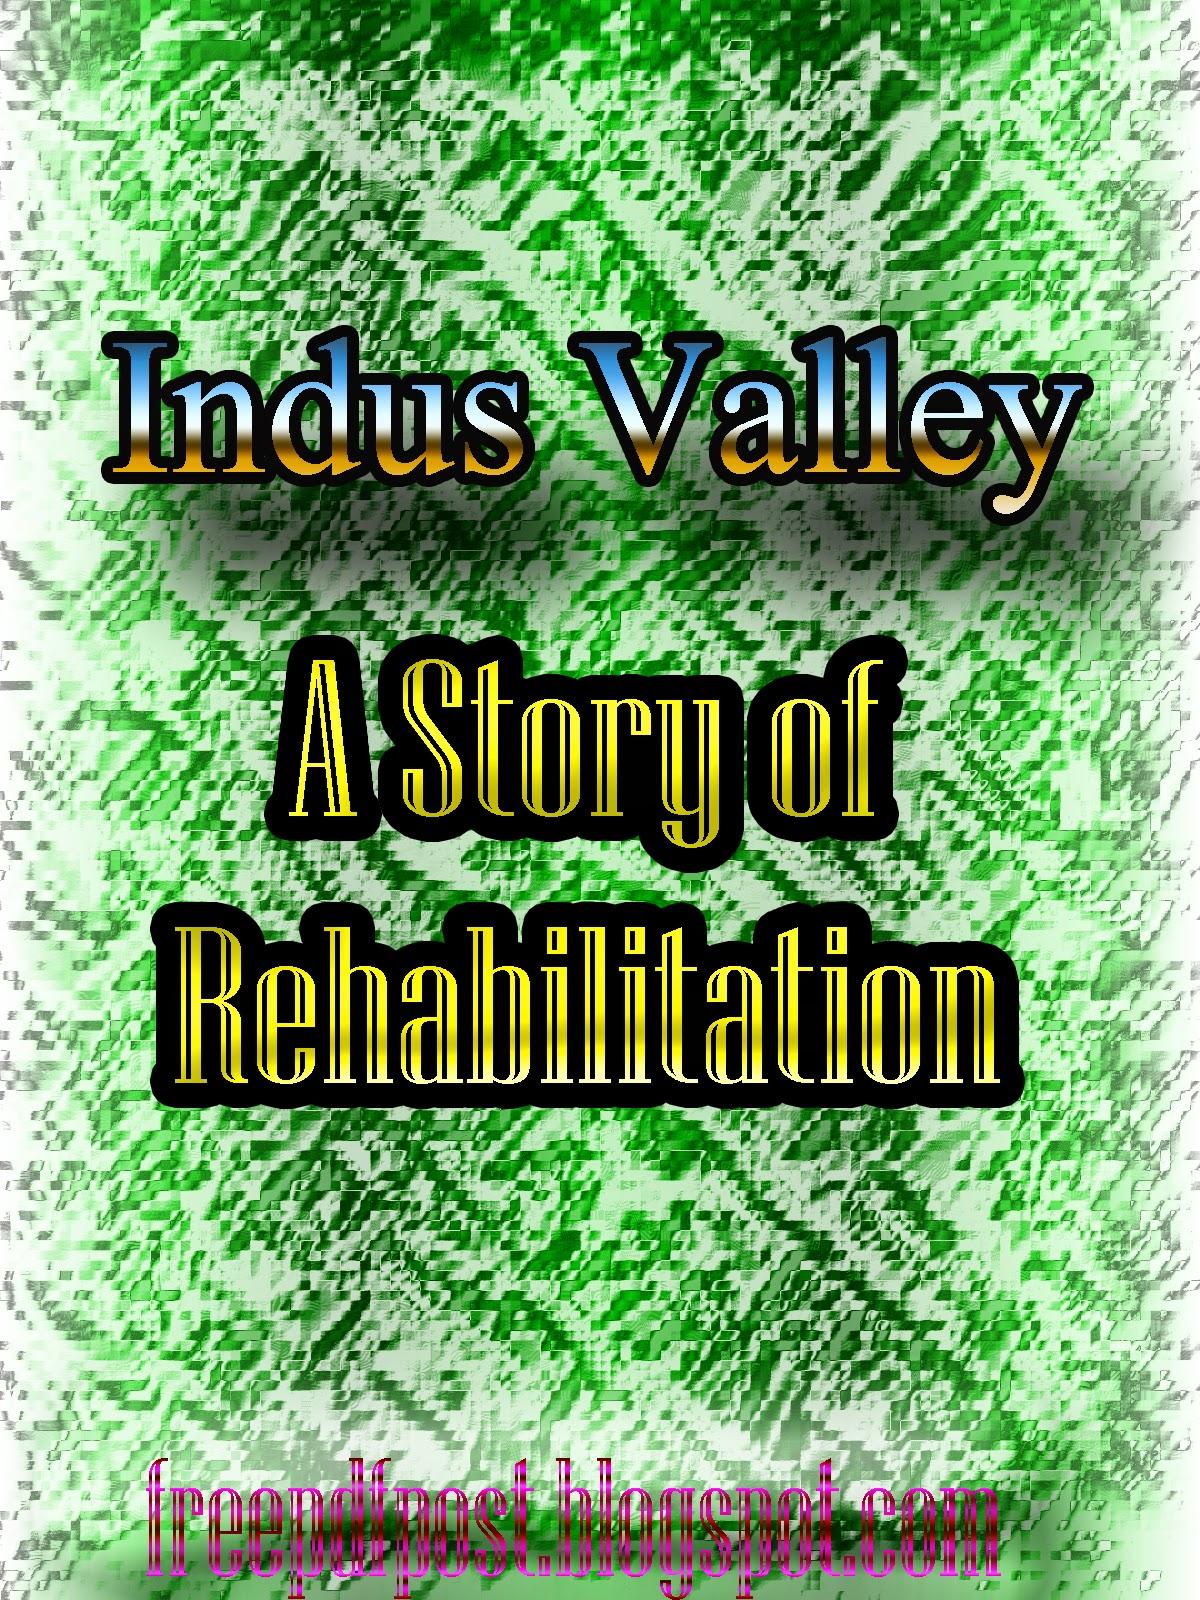 http://www.mediafire.com/view/b37vmvzt4ptgbya/IndusValley-obooko-hist0018.pdf